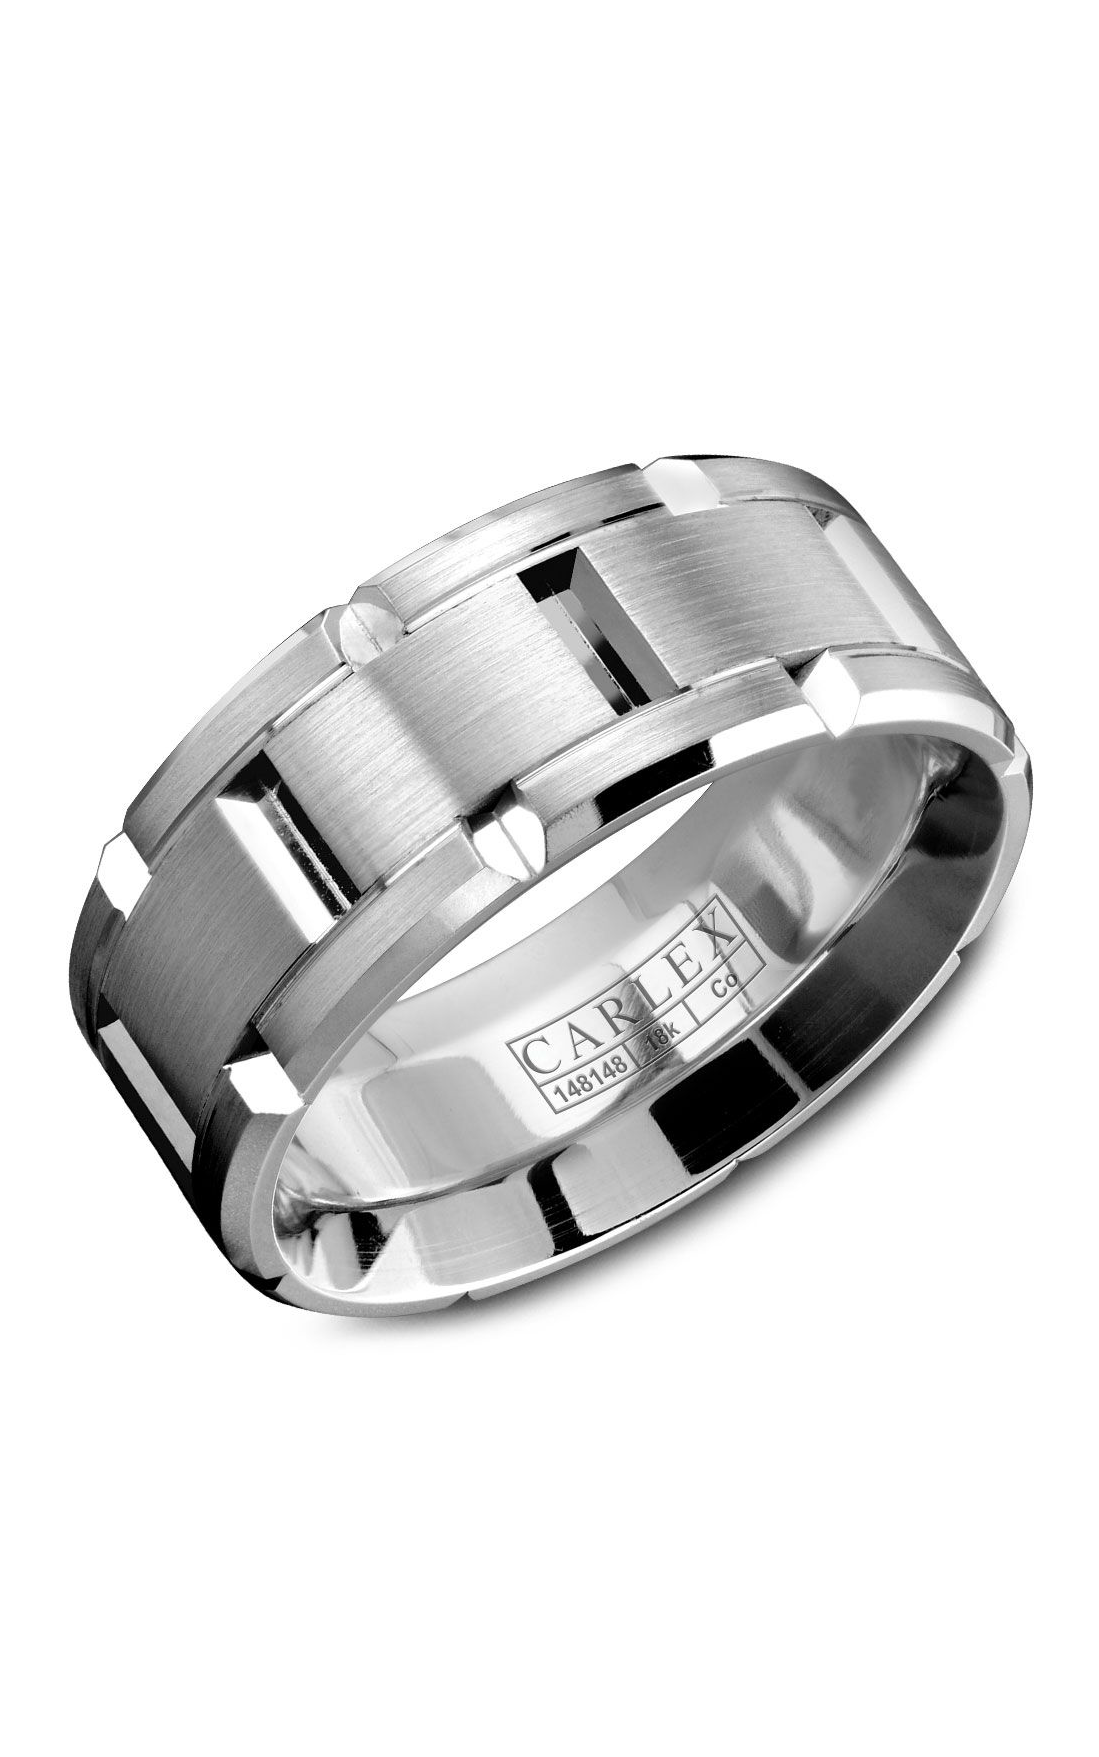 Carlex Sport Men's Wedding Band WB-9123WC product image